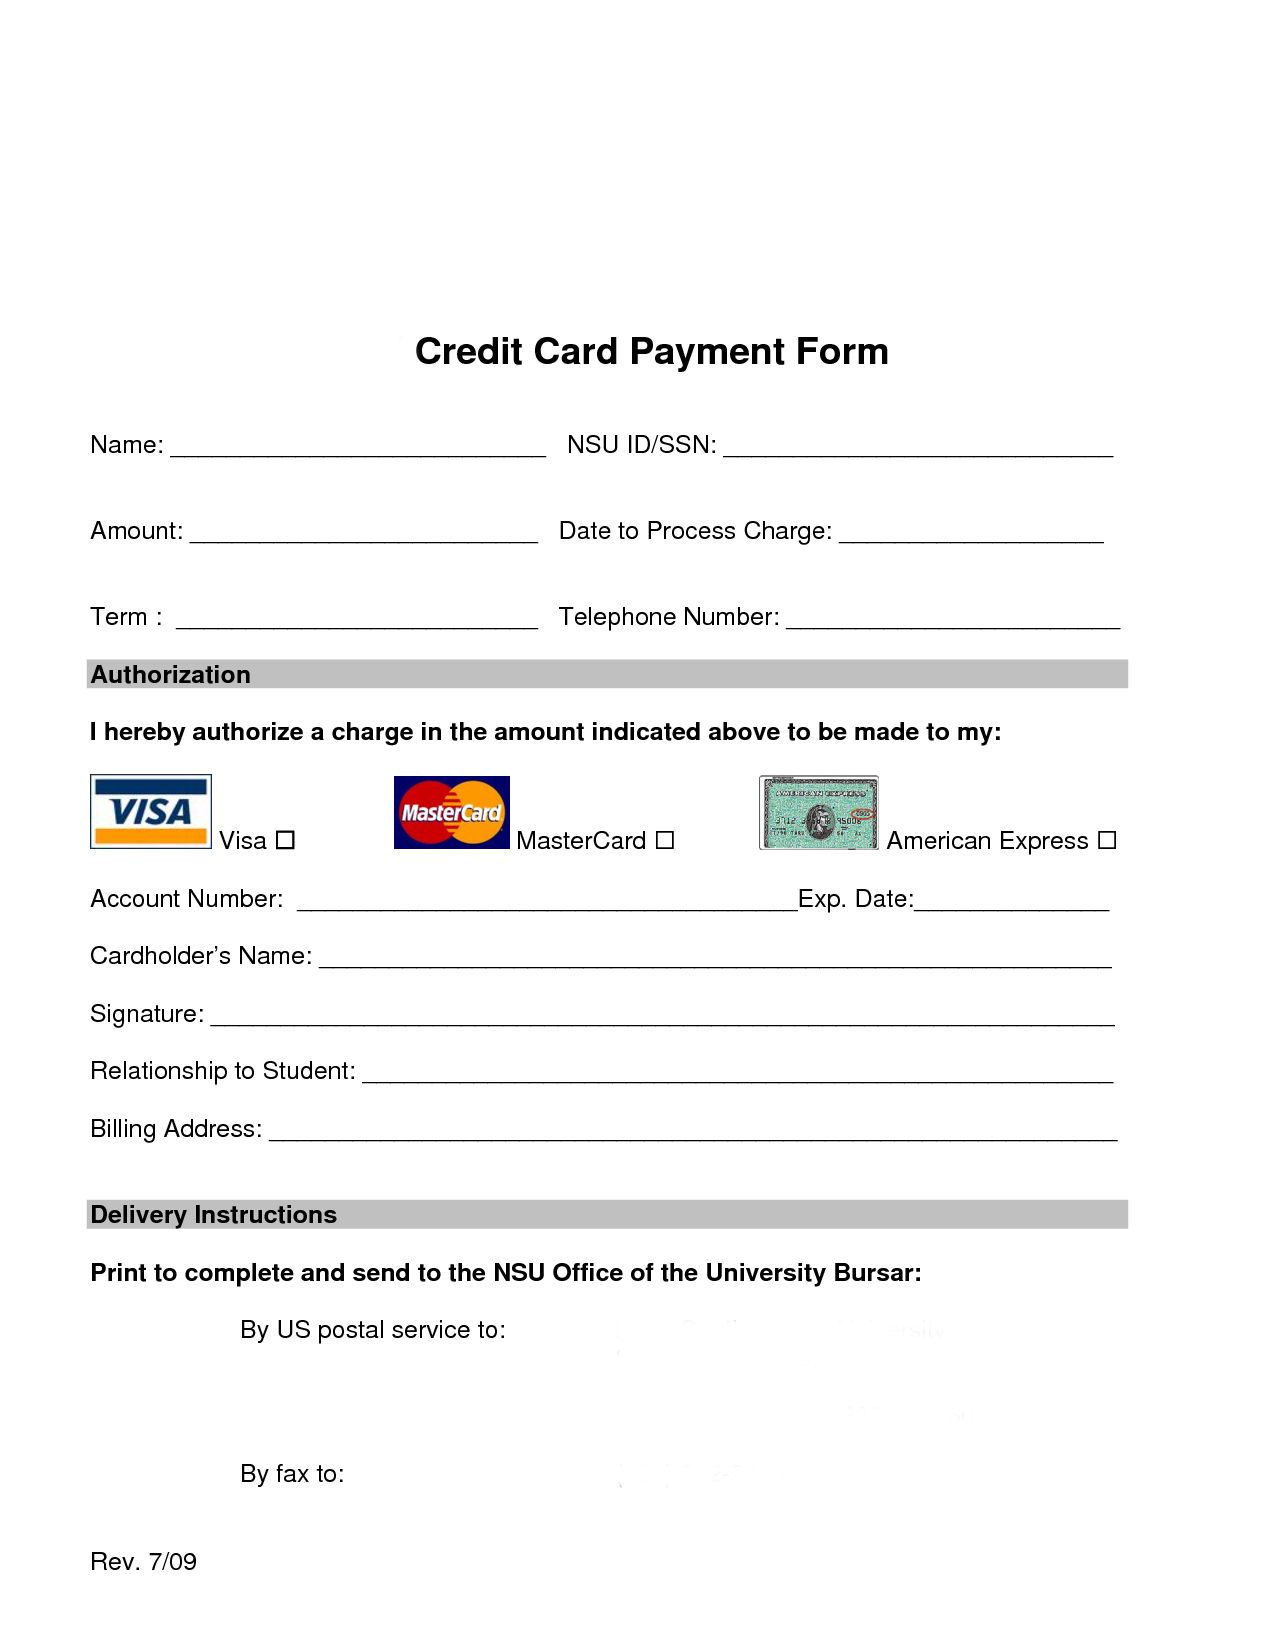 Credit Card Processing Form